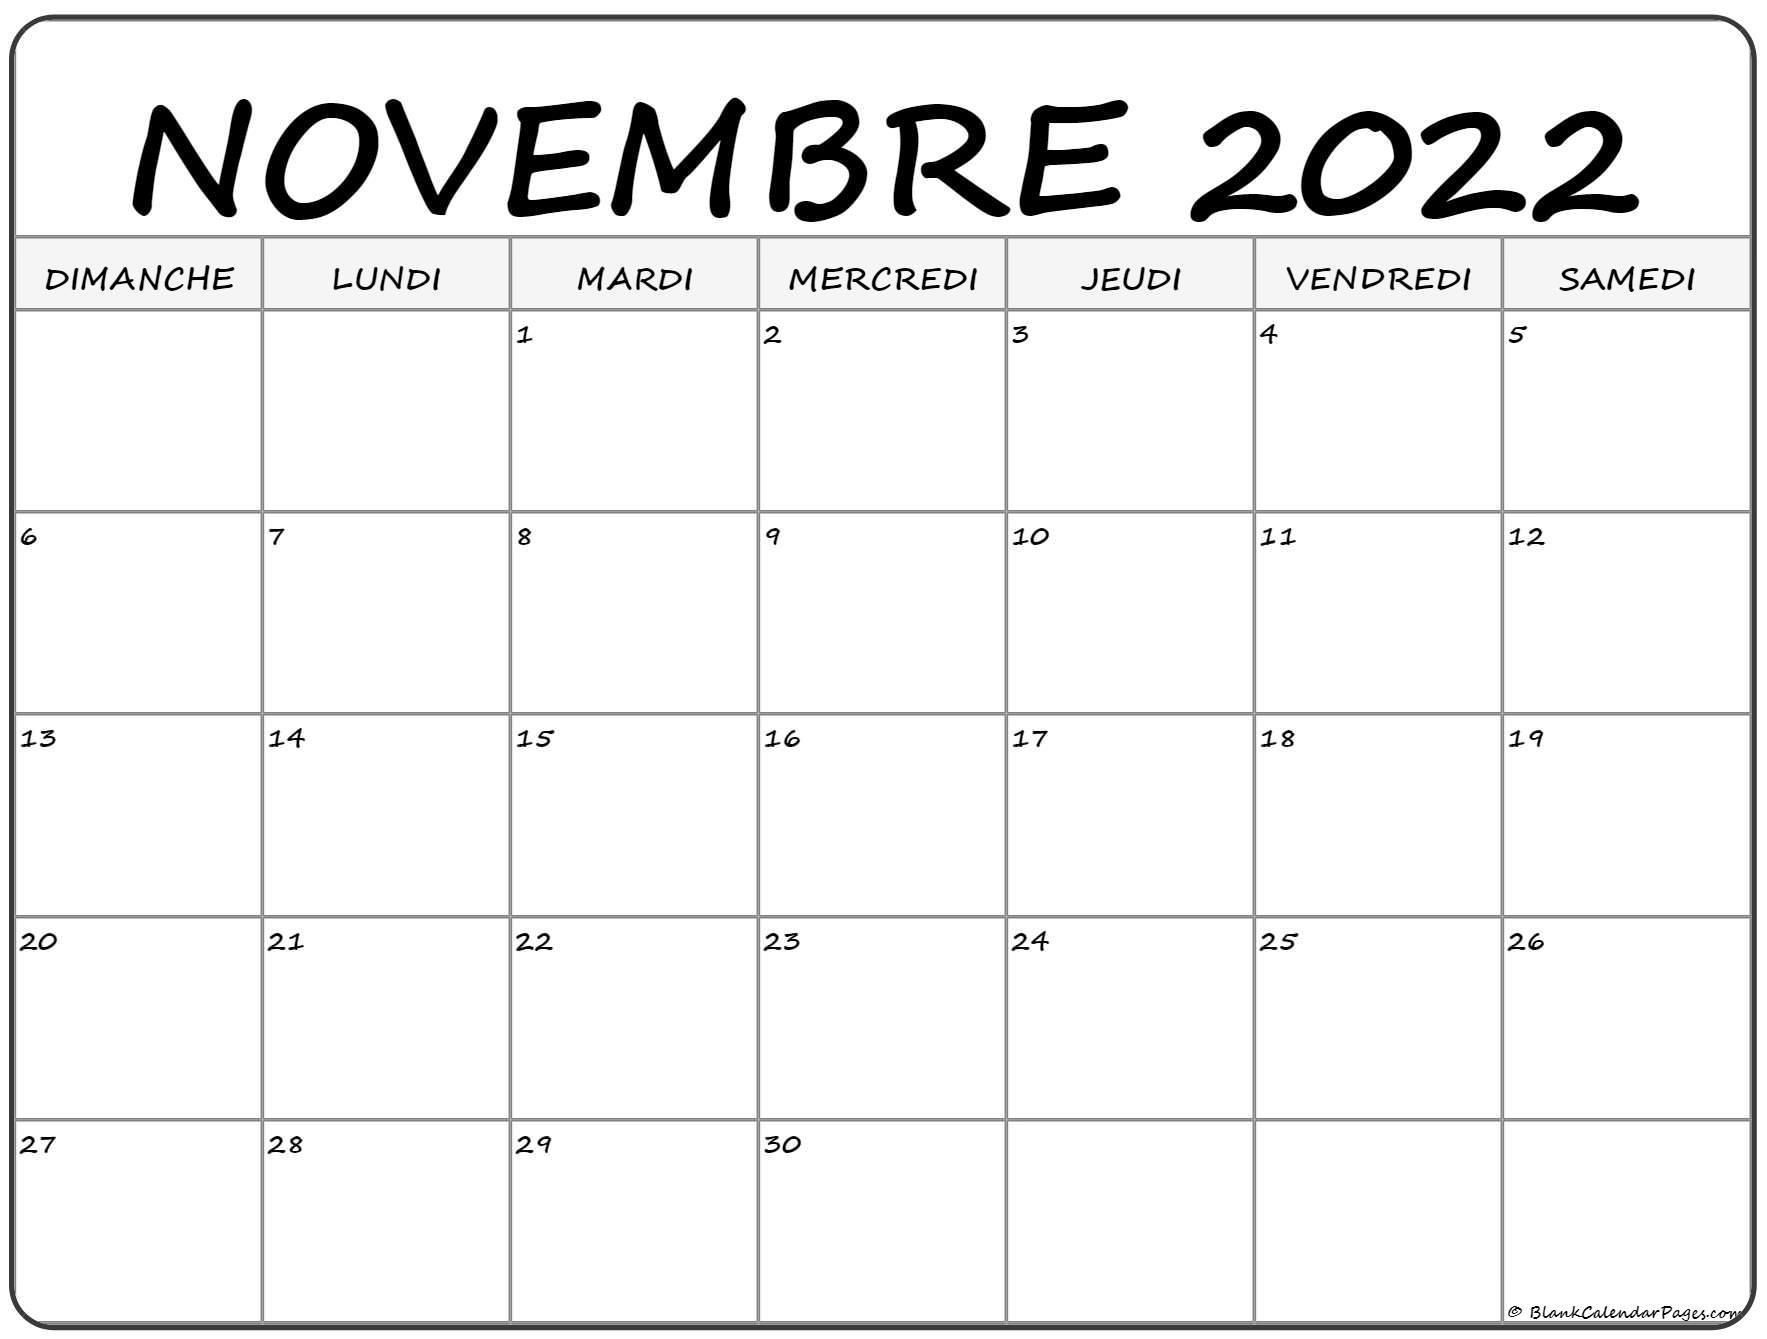 novembre 2022 calendrier gratuit